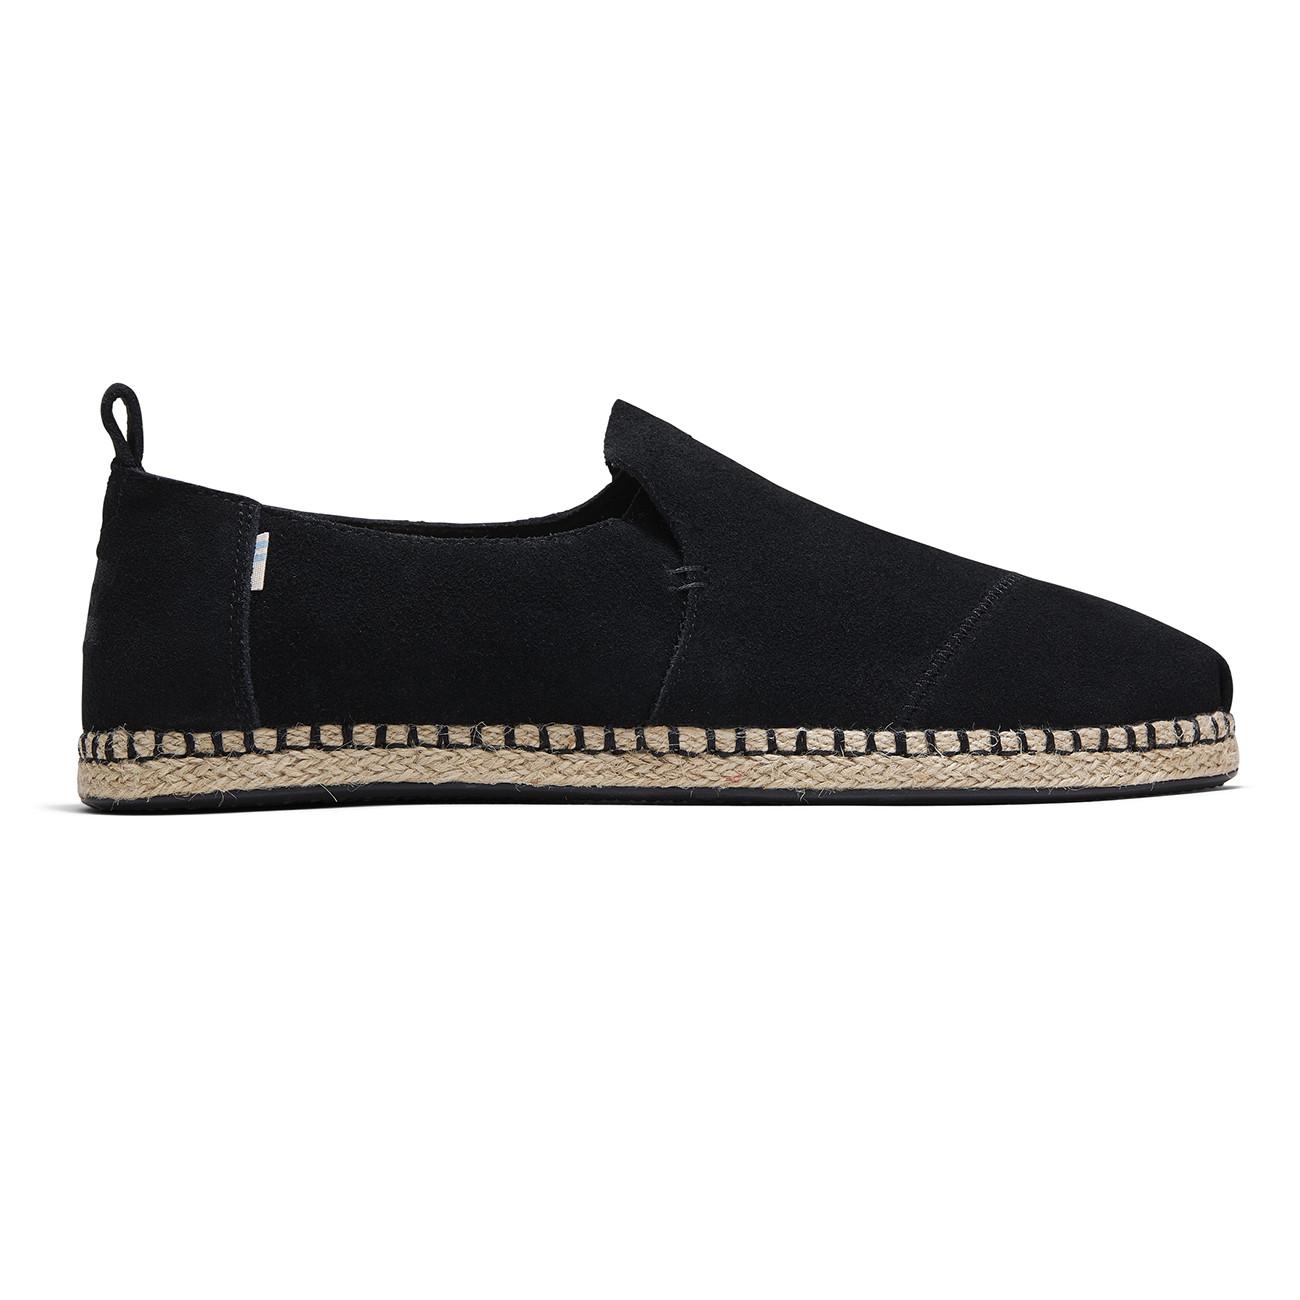 Sneakers Toms Deconstructed Alpargata